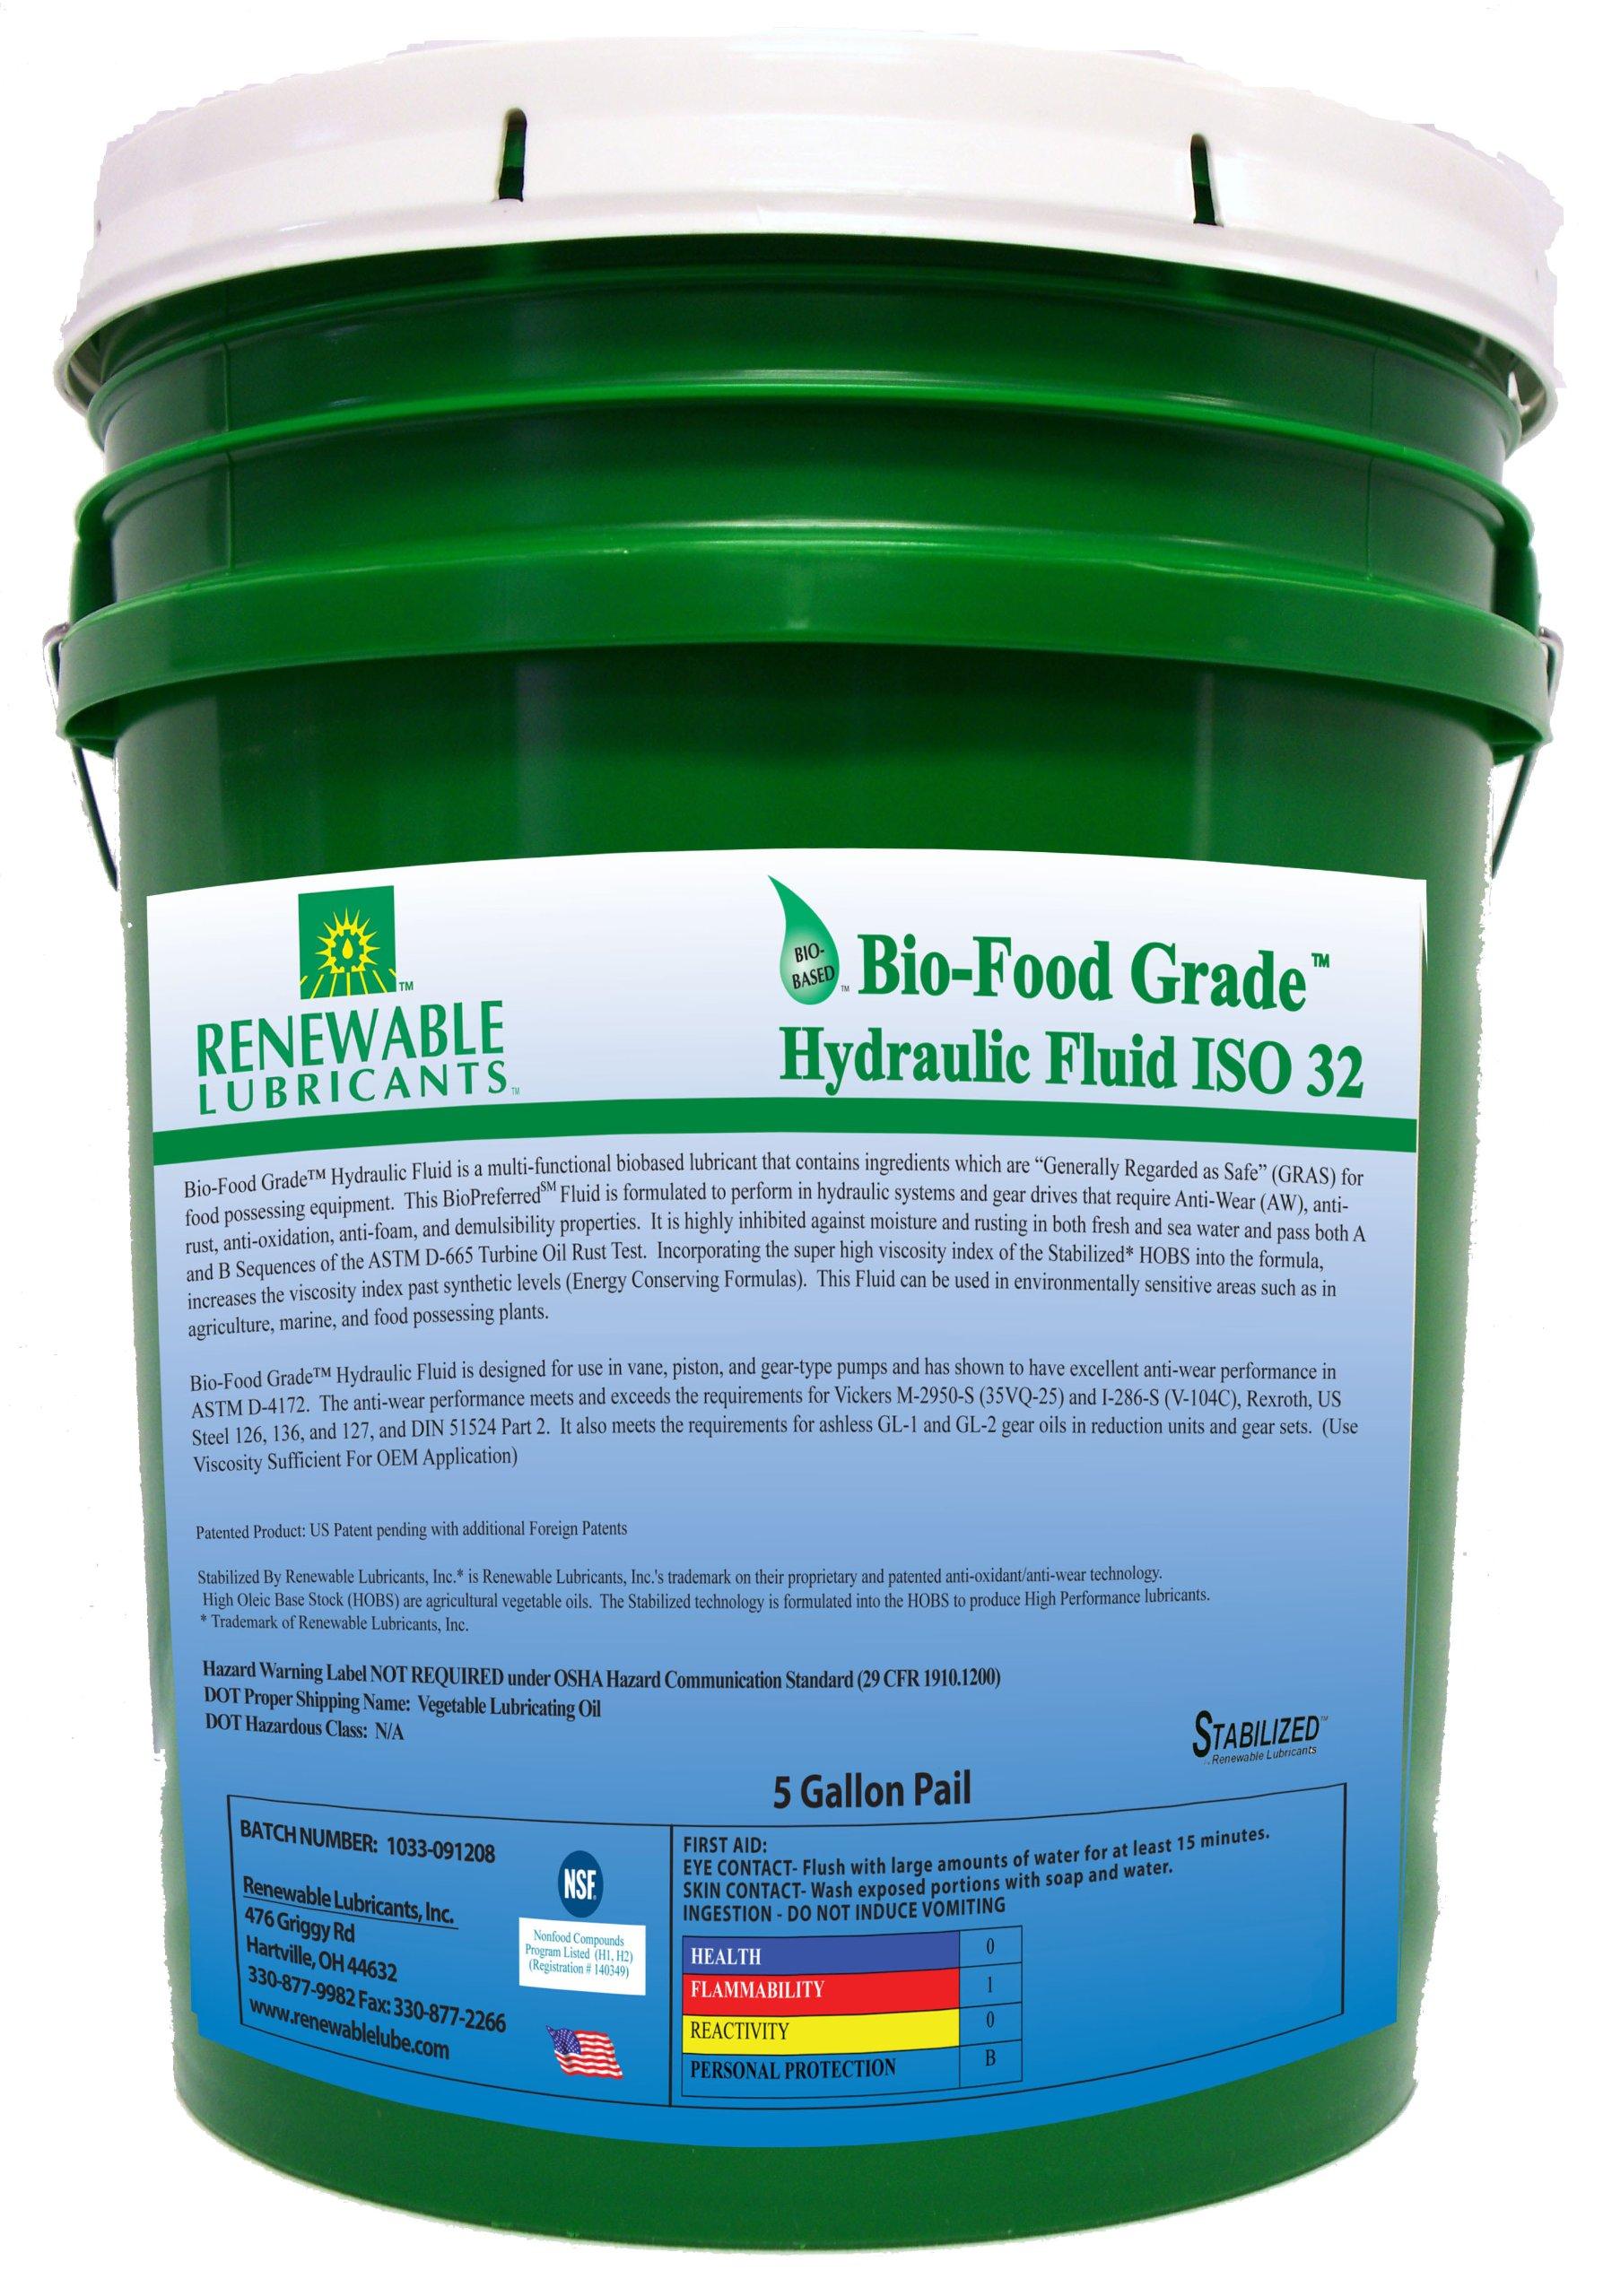 Renewable Lubricants Bio-Food Grade ISO 32 Hydraulic Fluid, 5 Gallon Pail